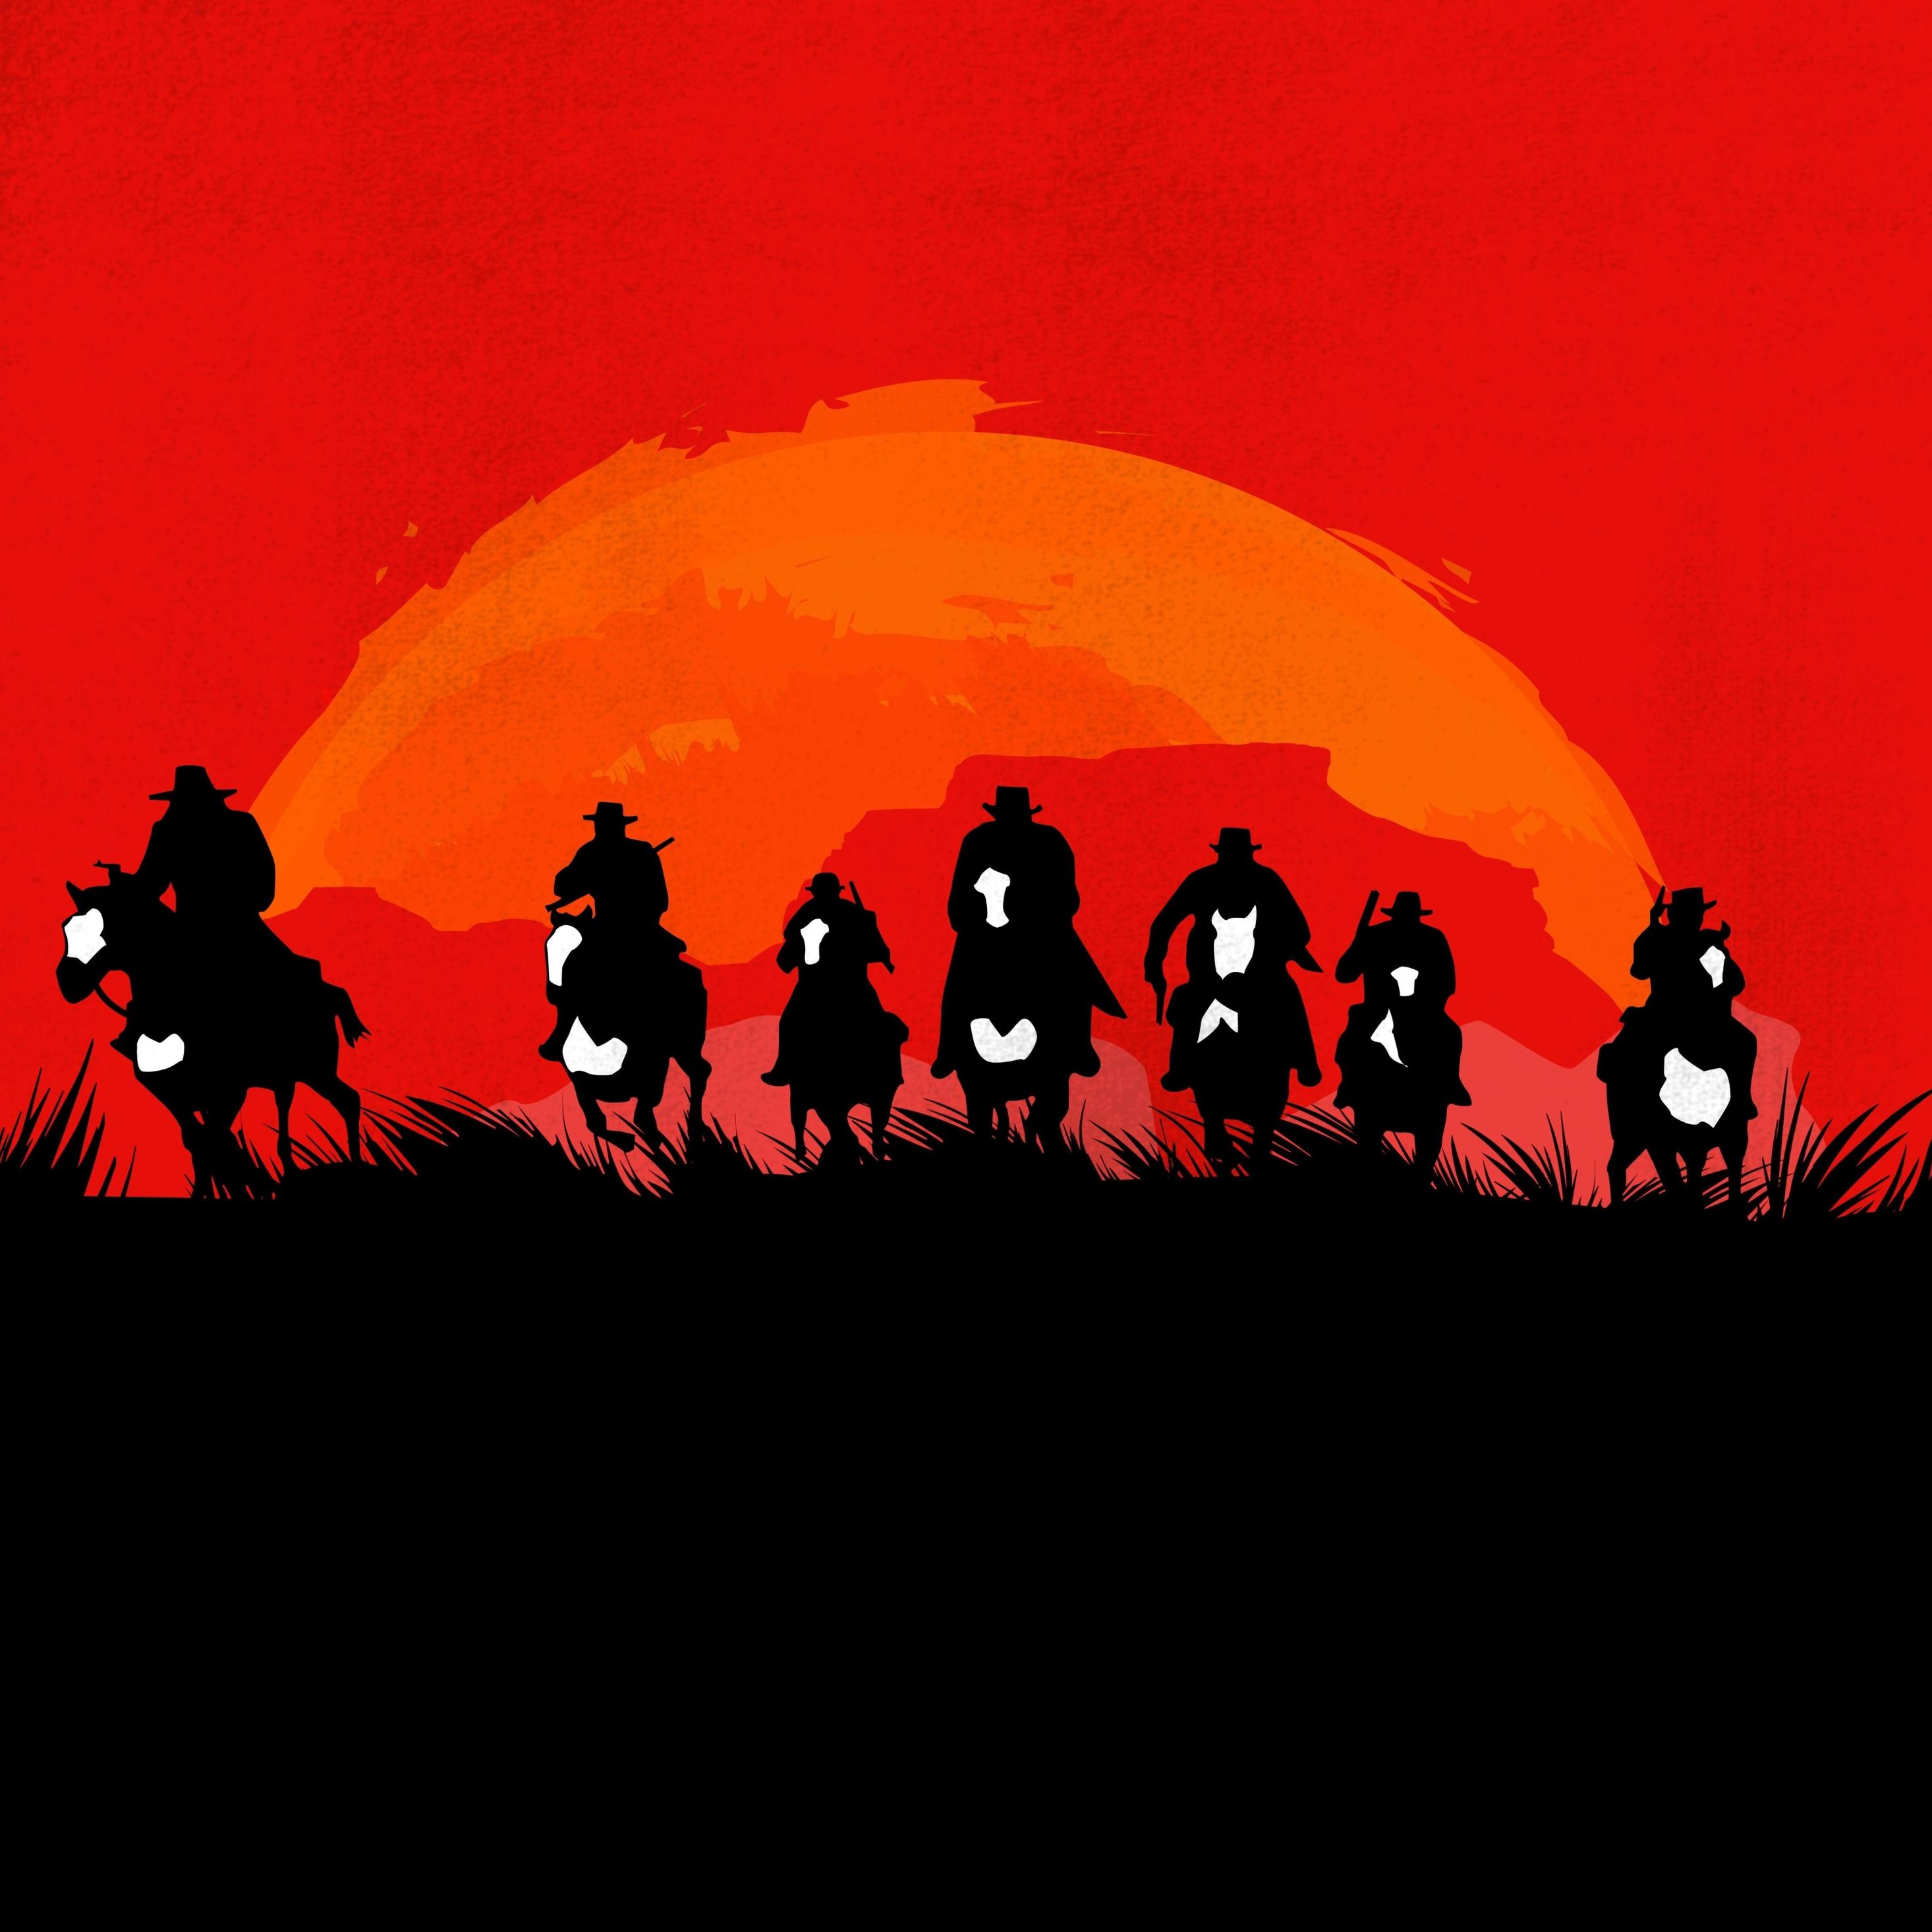 Red Dead Redemption Wallpaper Hd: Red Dead Redemption 2 Game, HD 8K Wallpaper